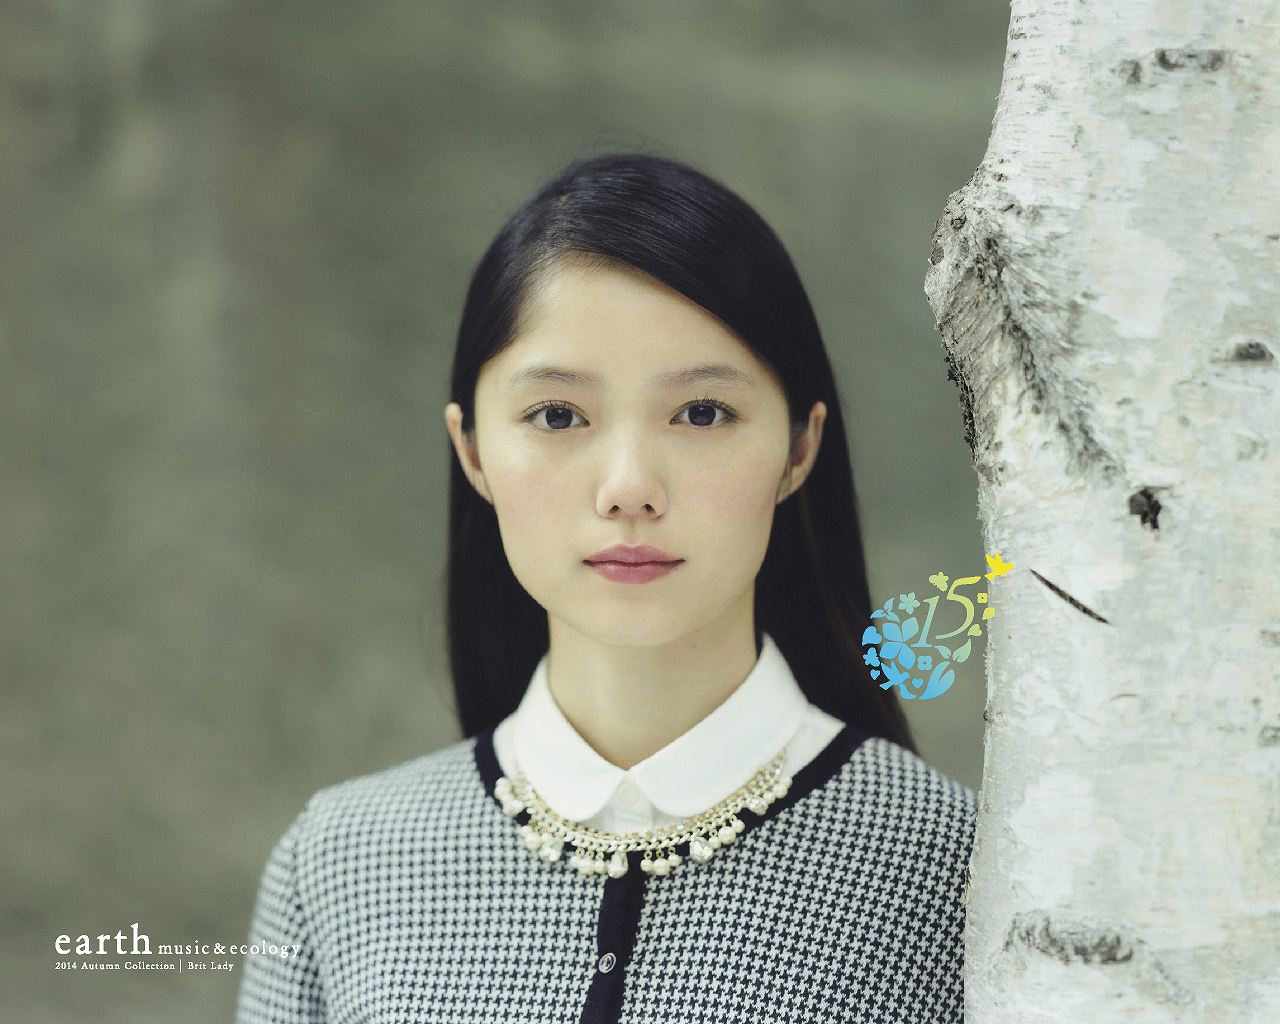 earth music&ecology広告の宮崎あおいが劣化してる